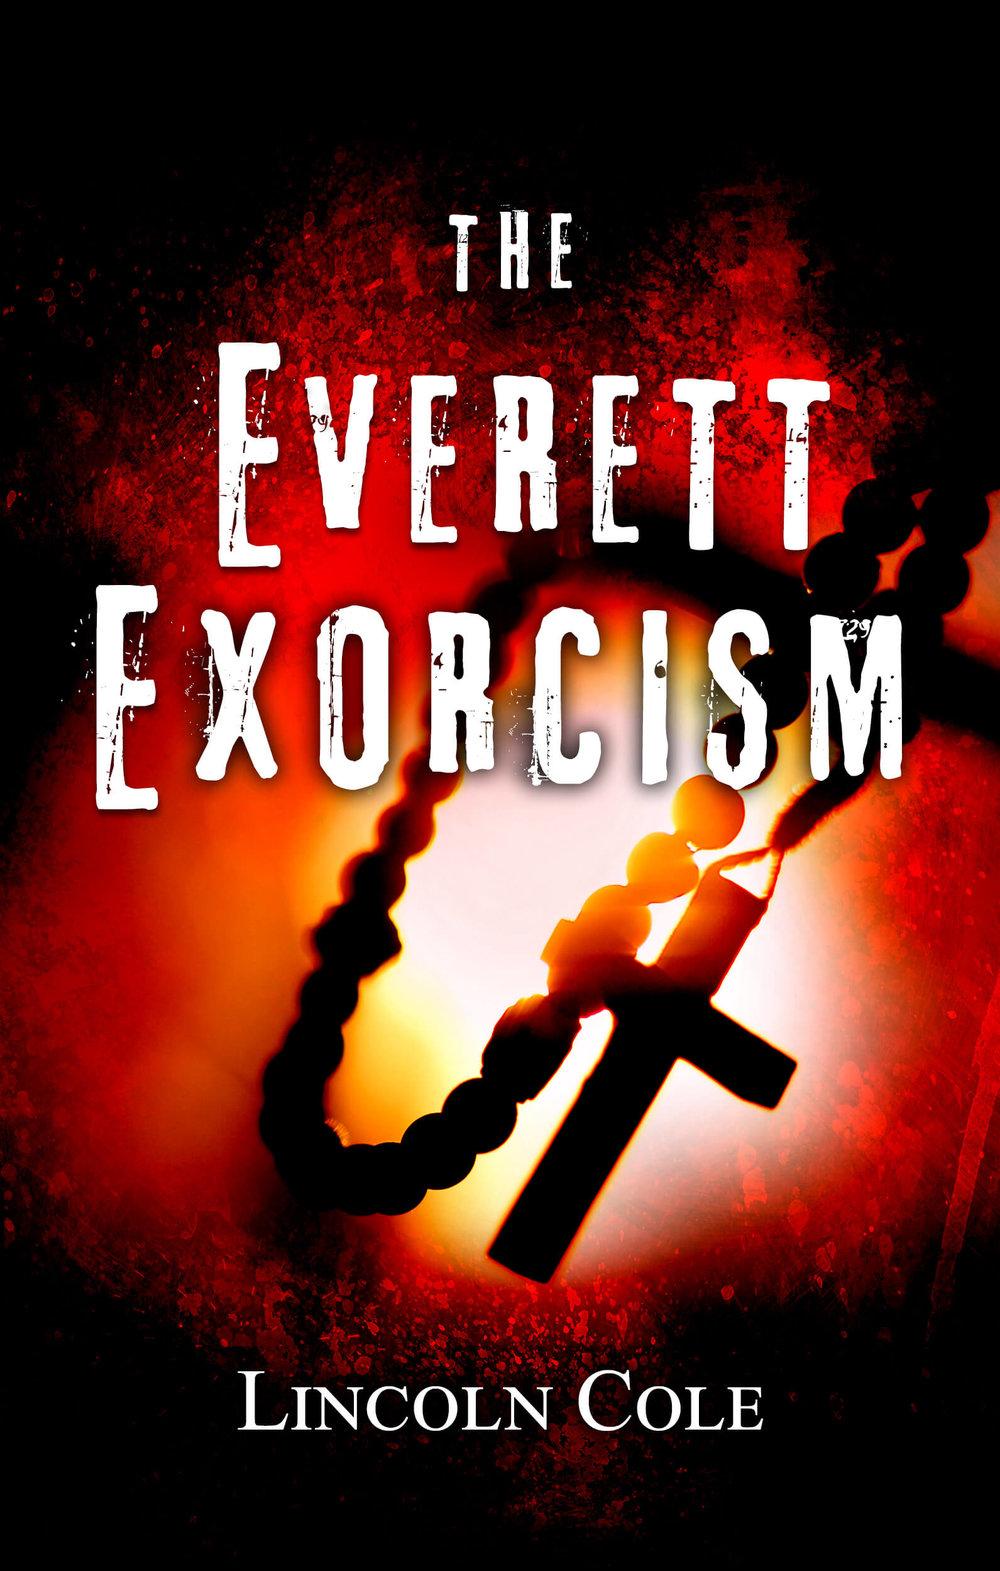 The Everett Exorcism - kindle cover.jpg